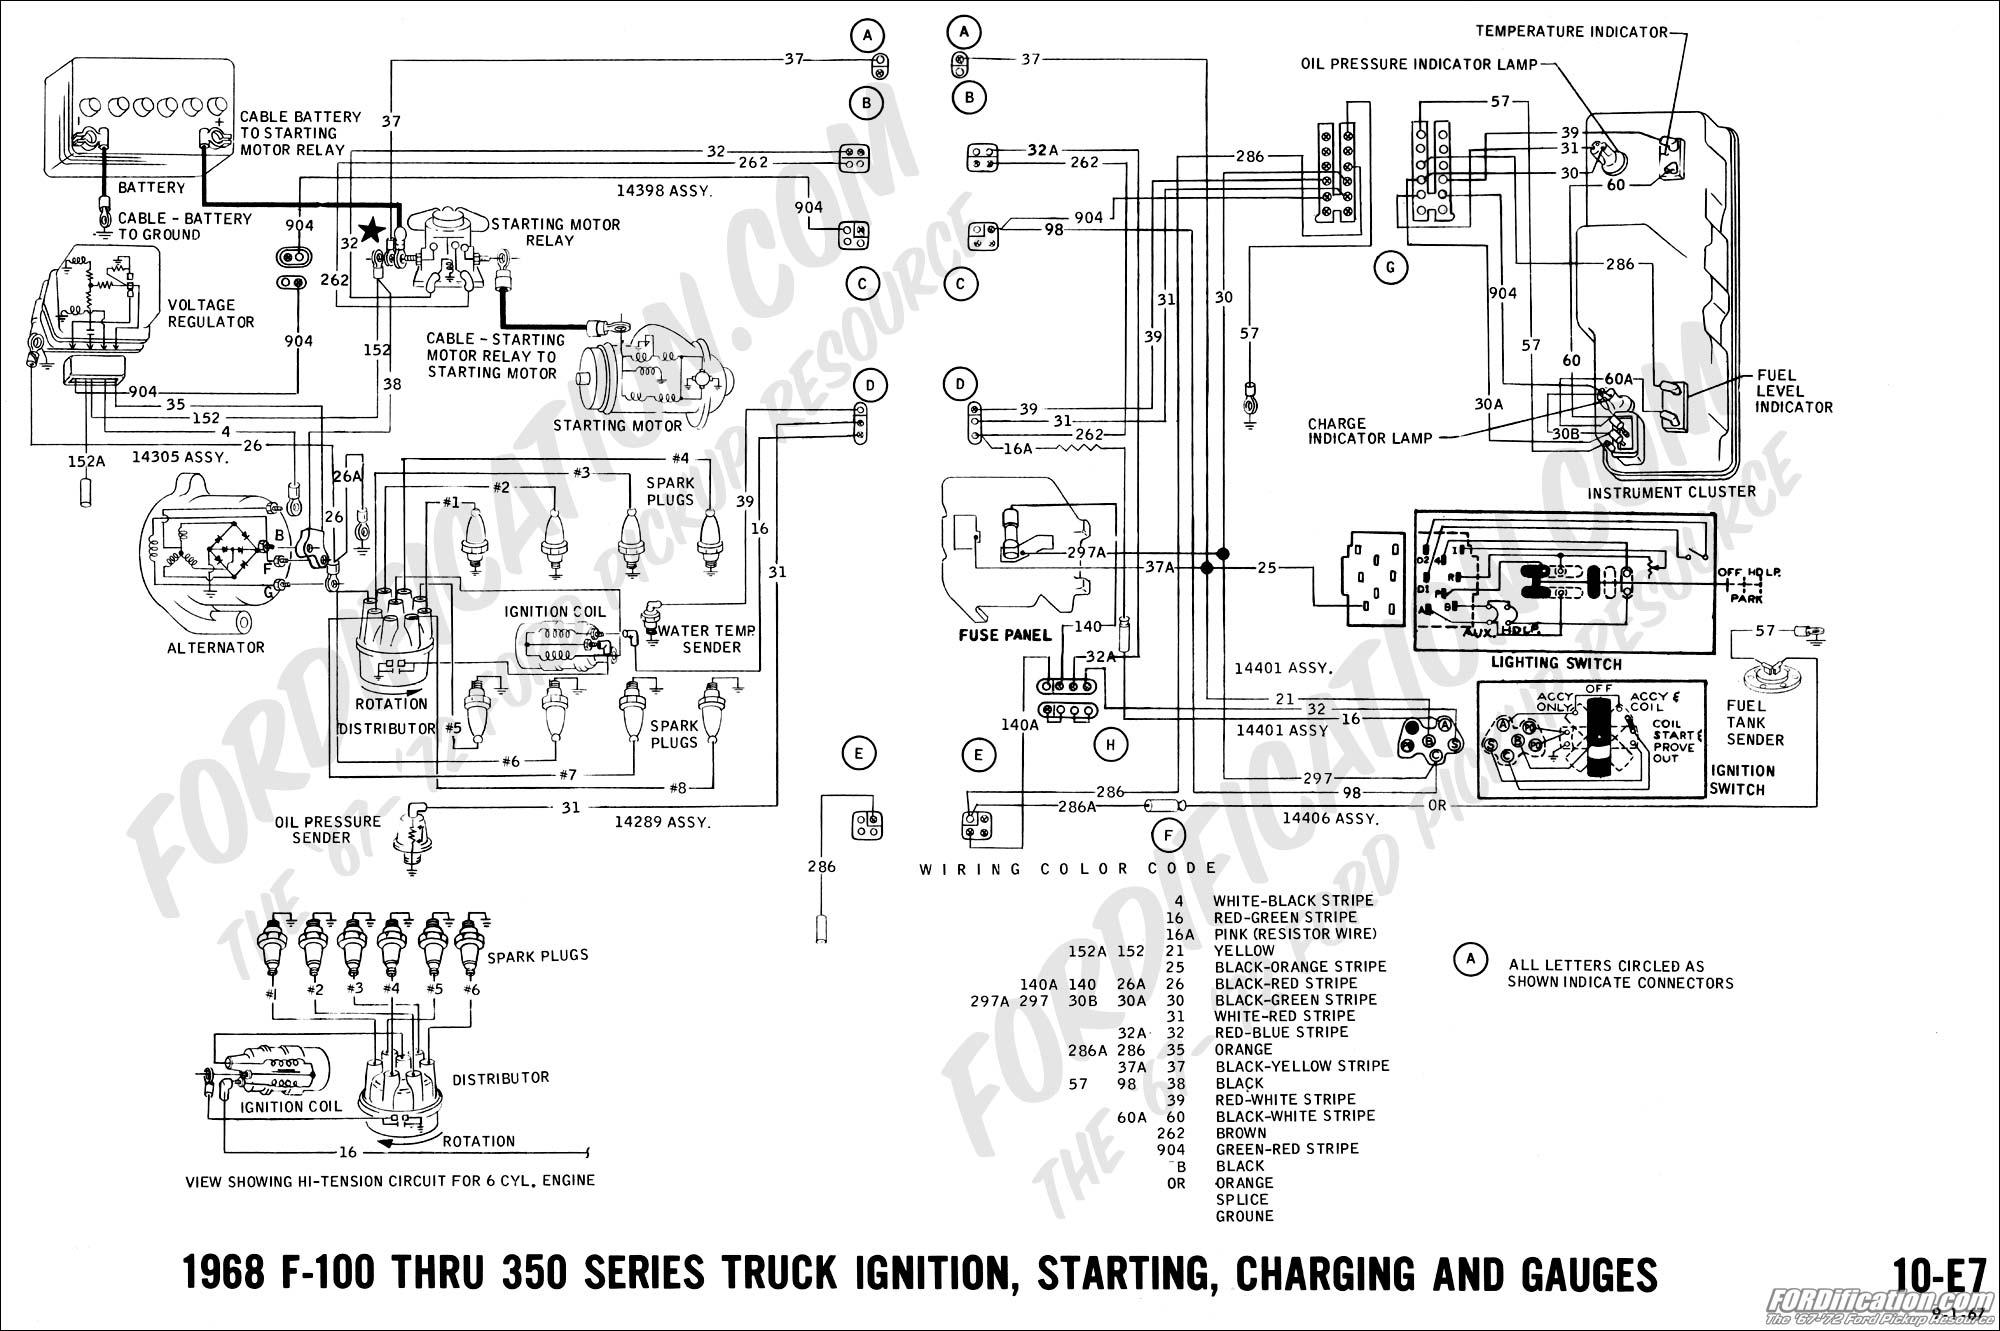 Swell 1968 Ford Truck Wiring Diagram Wiring Diagram Data Schema Wiring Cloud Licukshollocom